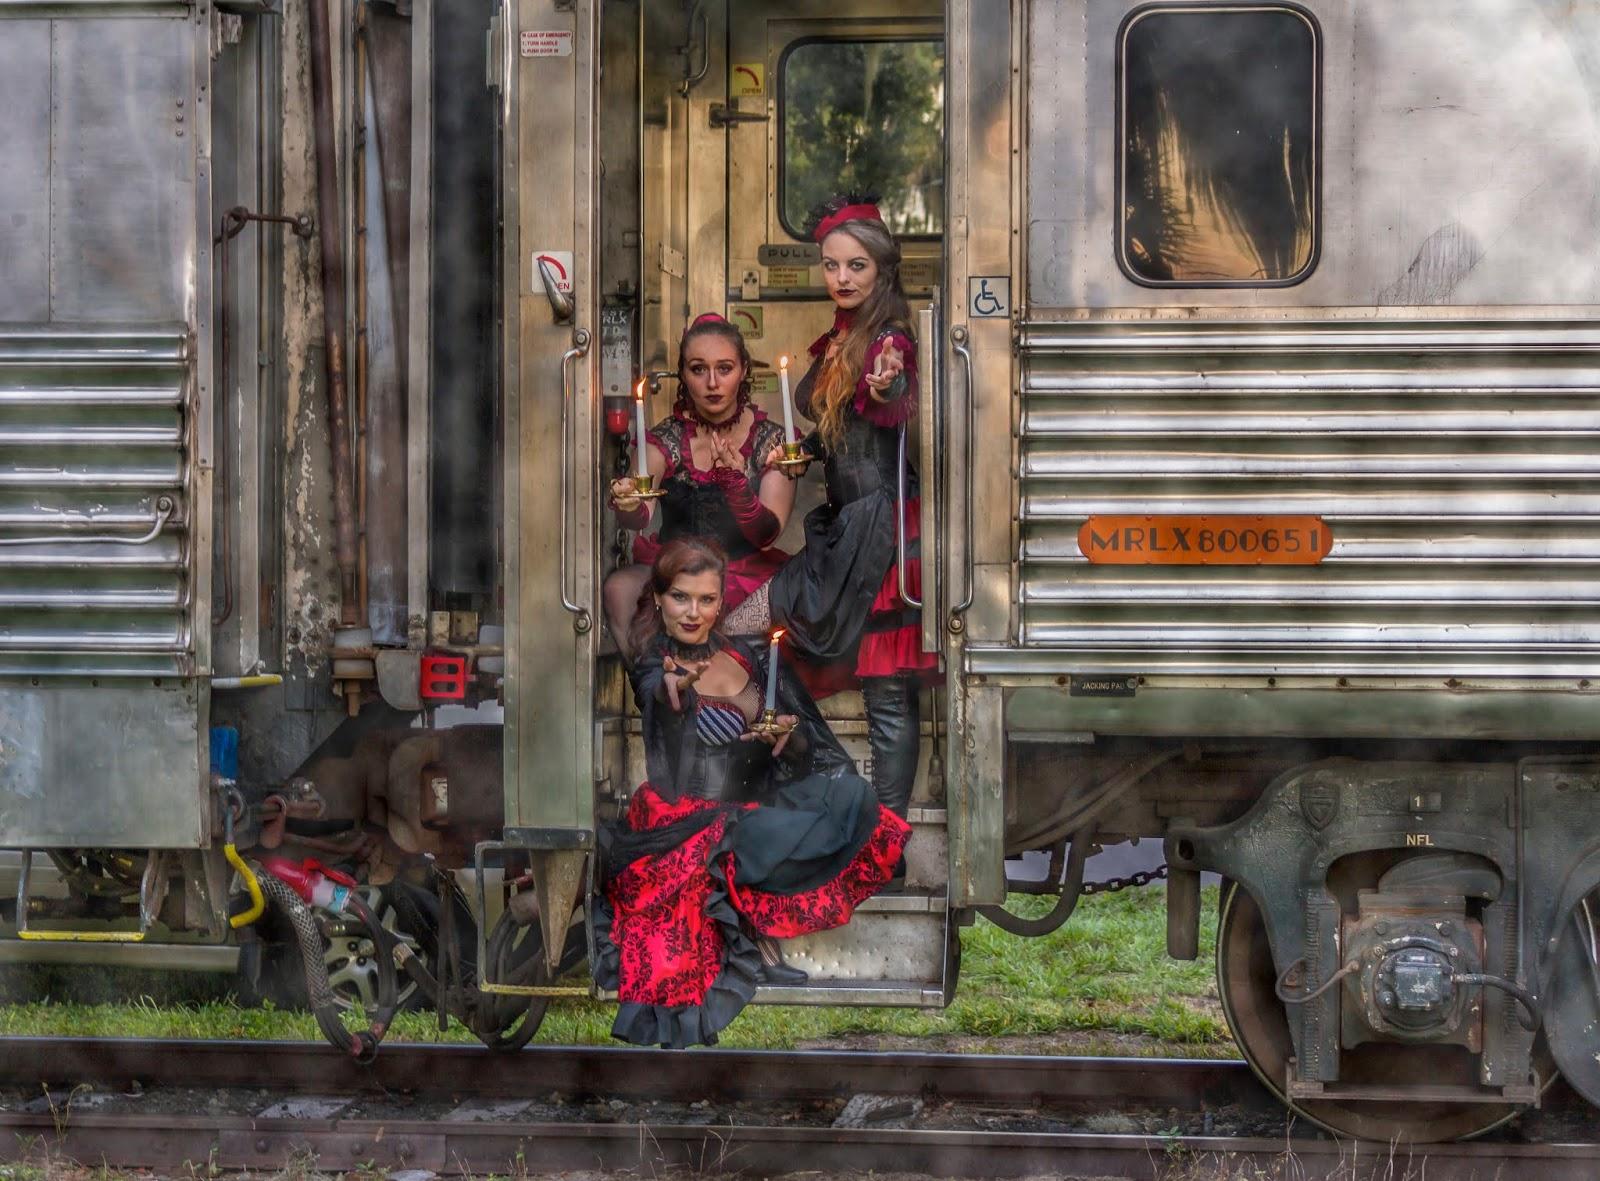 The Royal Palm Railway Experience And Phantasmagoria Present The